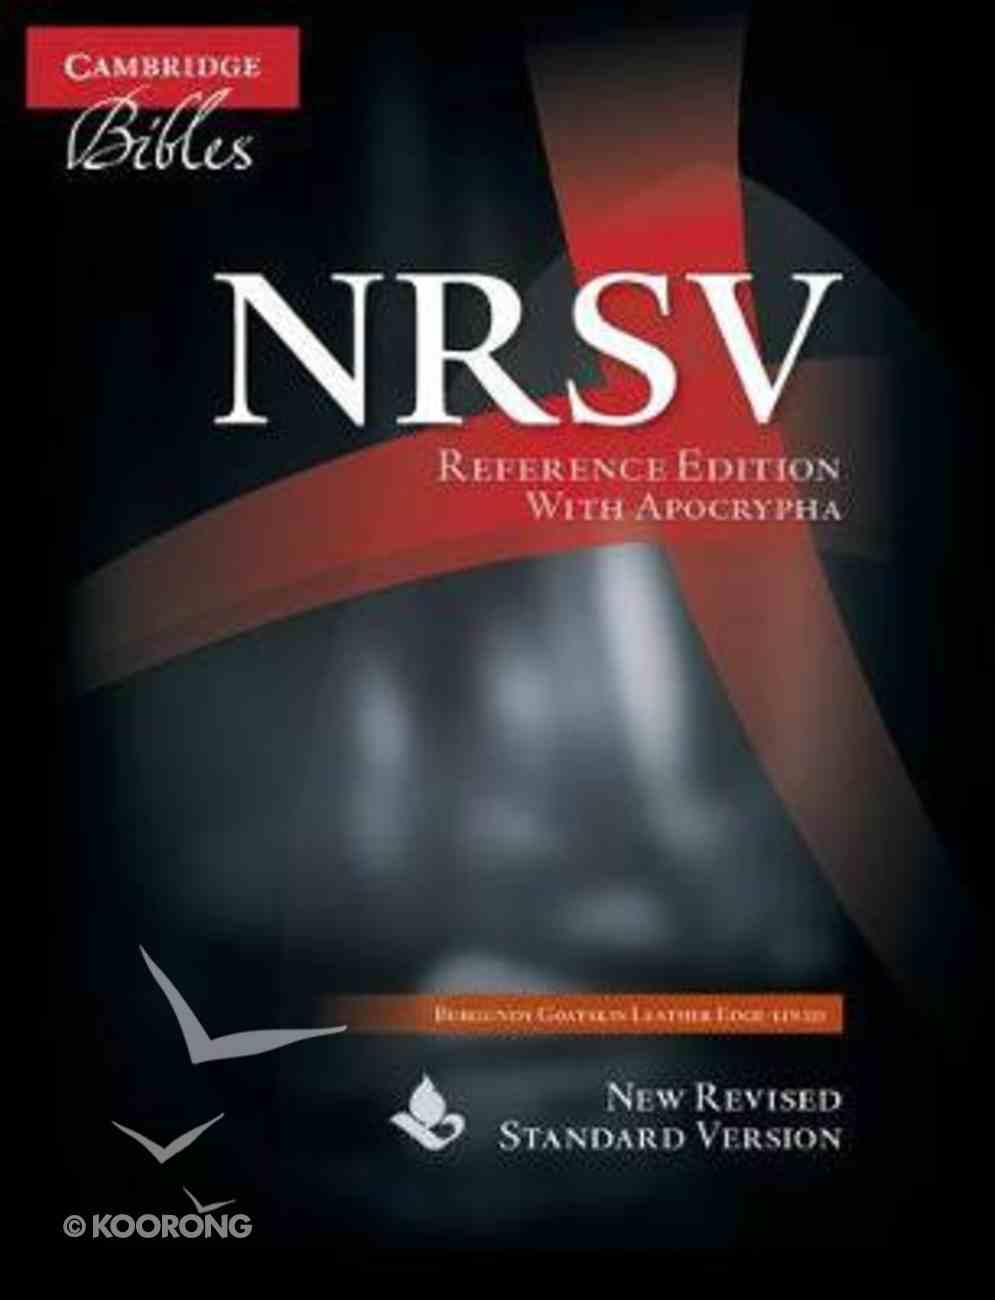 NRSV Reference Bible With Apocrypha Burgundy Goatskin Genuine Leather